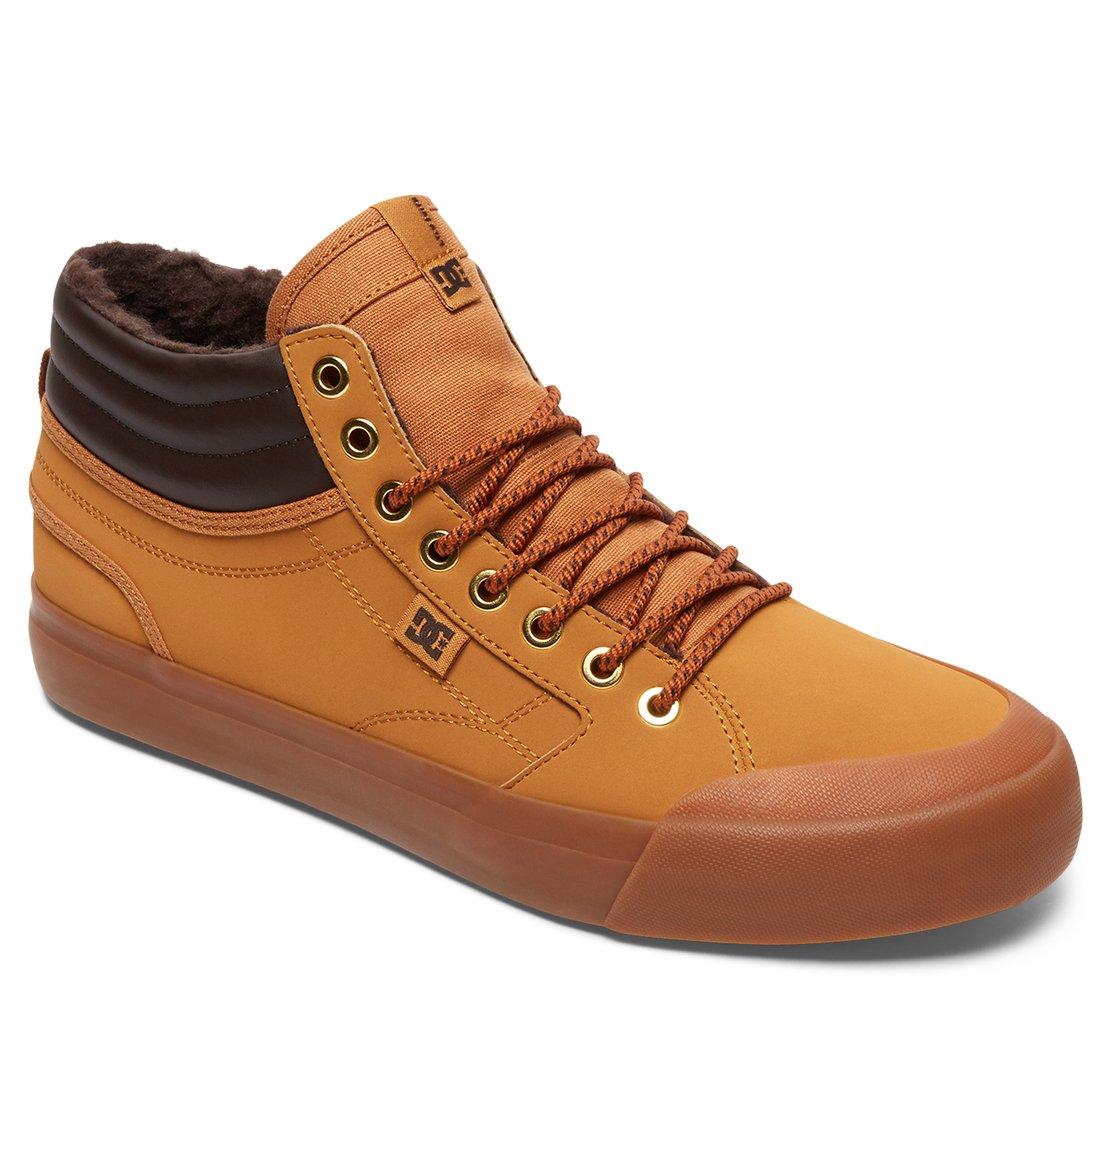 DC Shoes Evan Smith Hi WNT Zapatillas Hombre, Marrón (Wheat), 45 EU (10.5 UK)